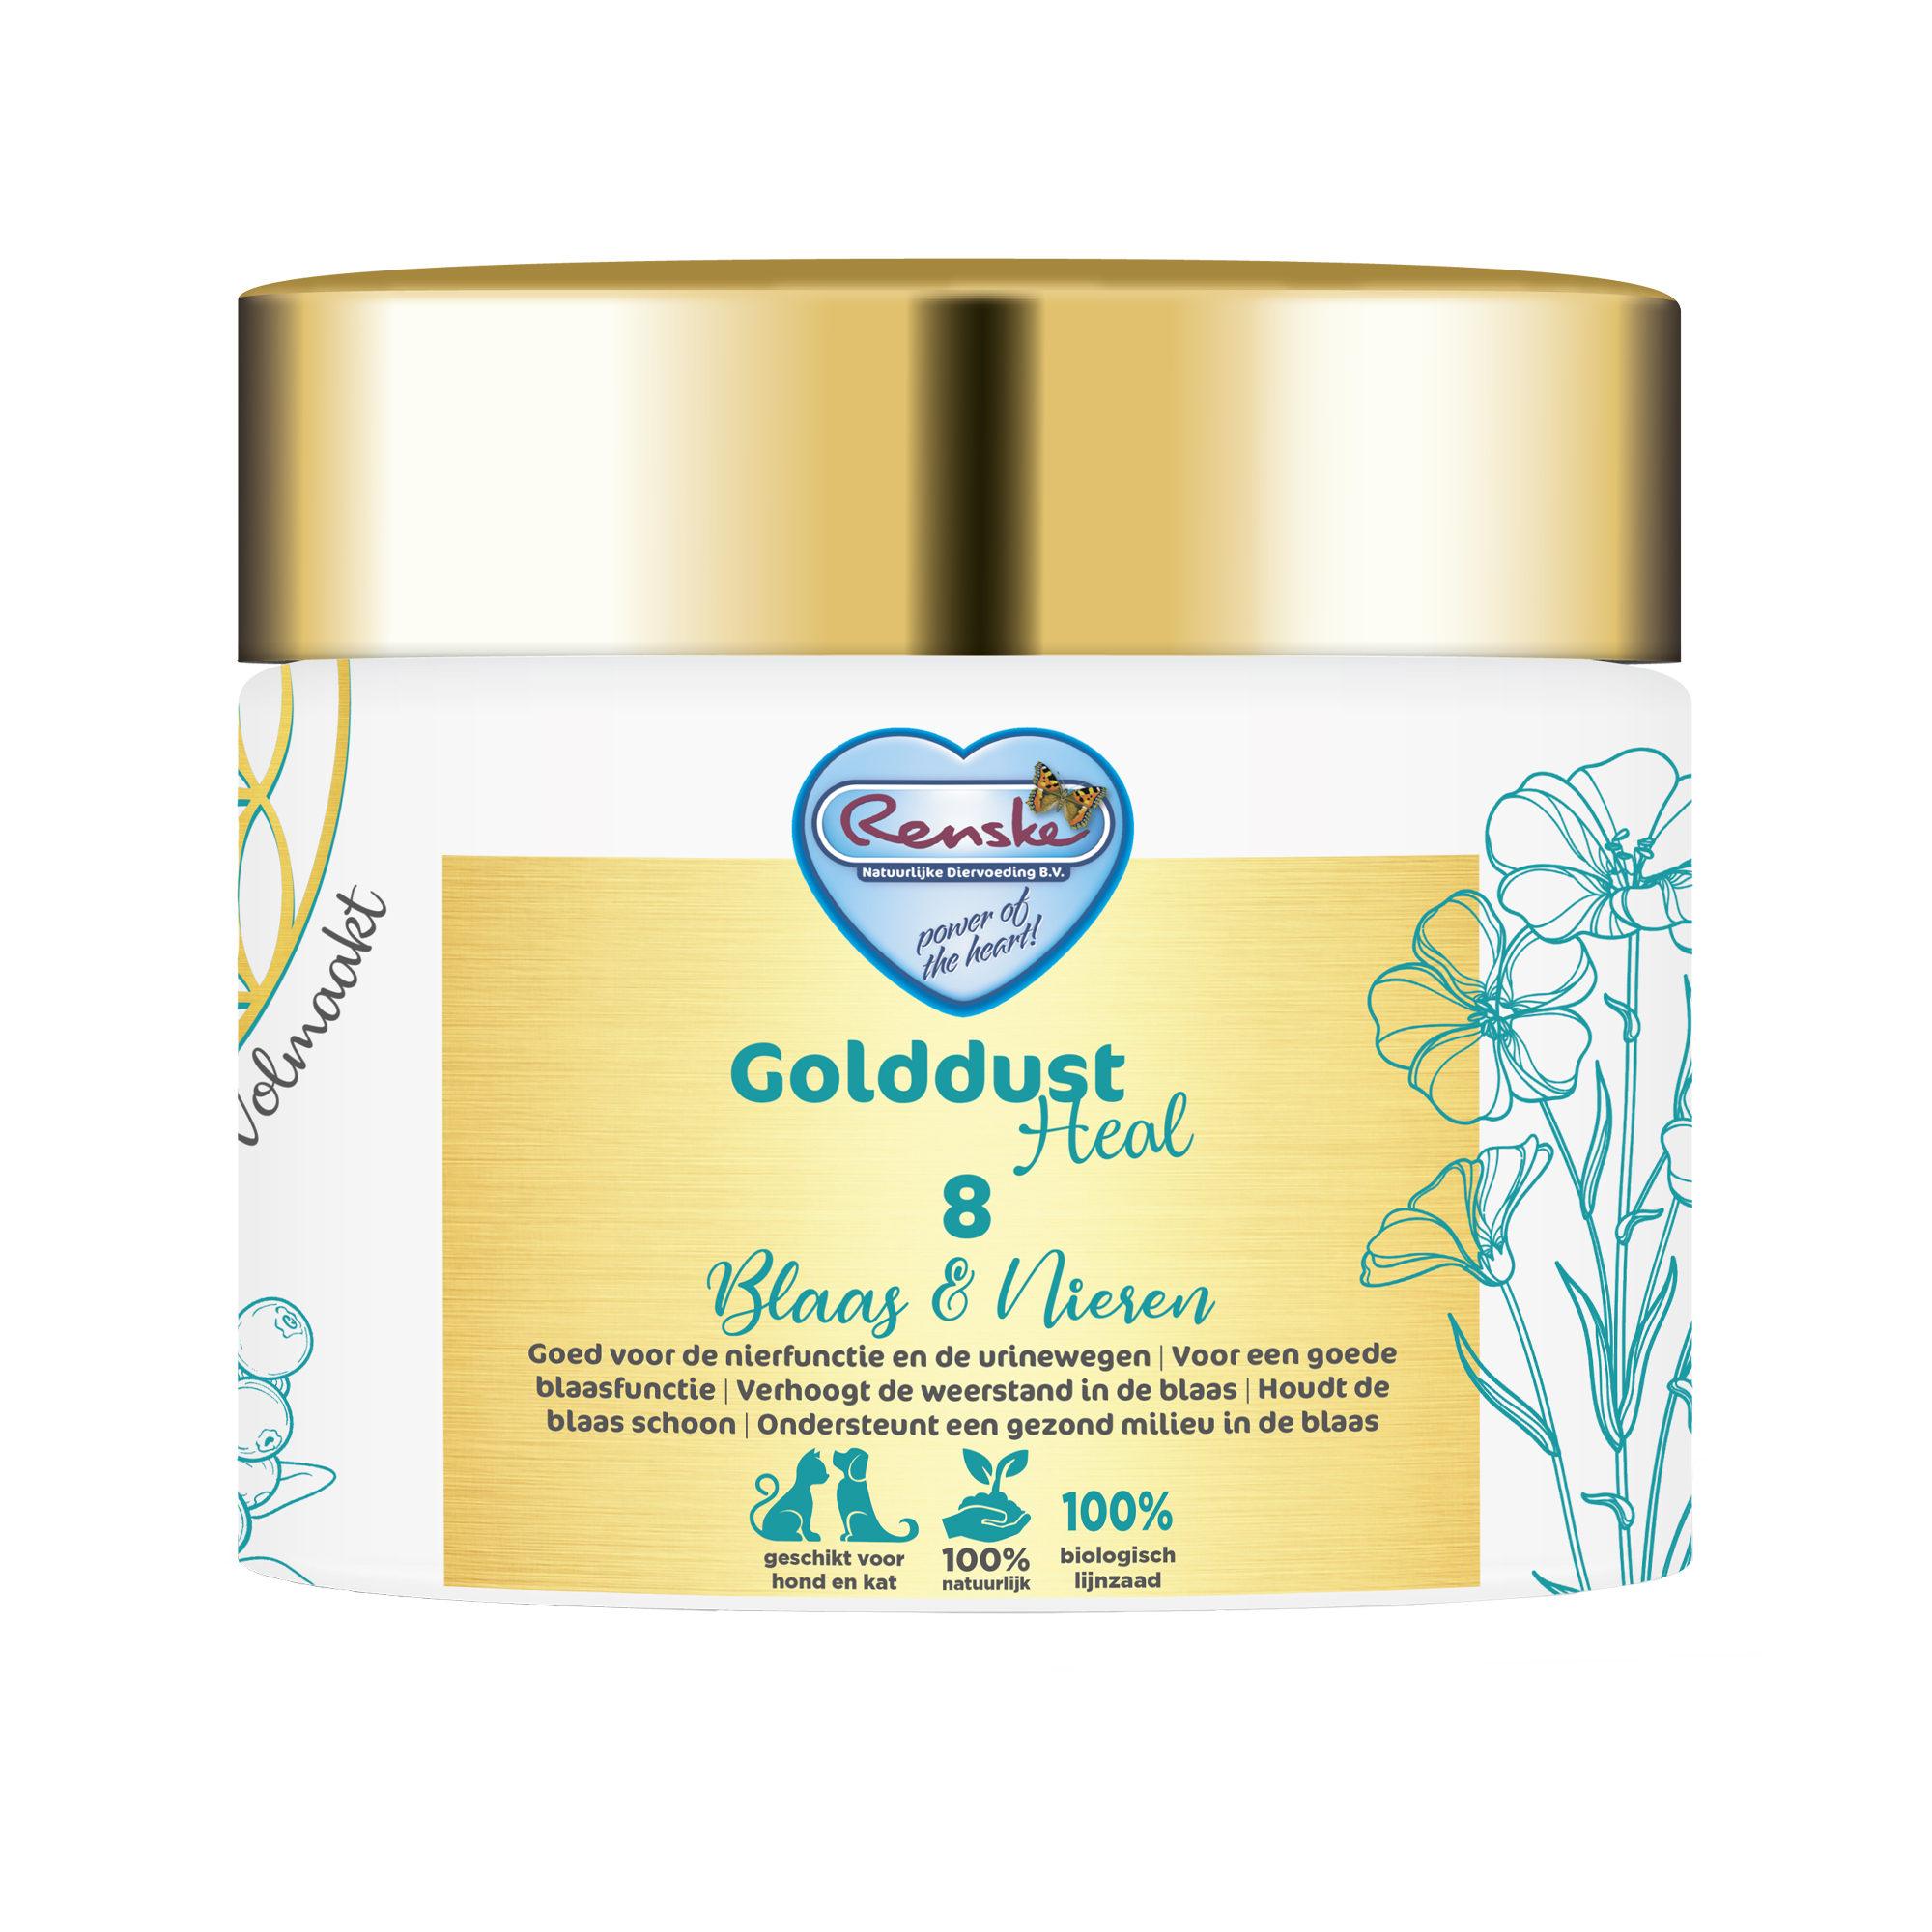 Renske Golddust Heal 8 - Vessie et reins